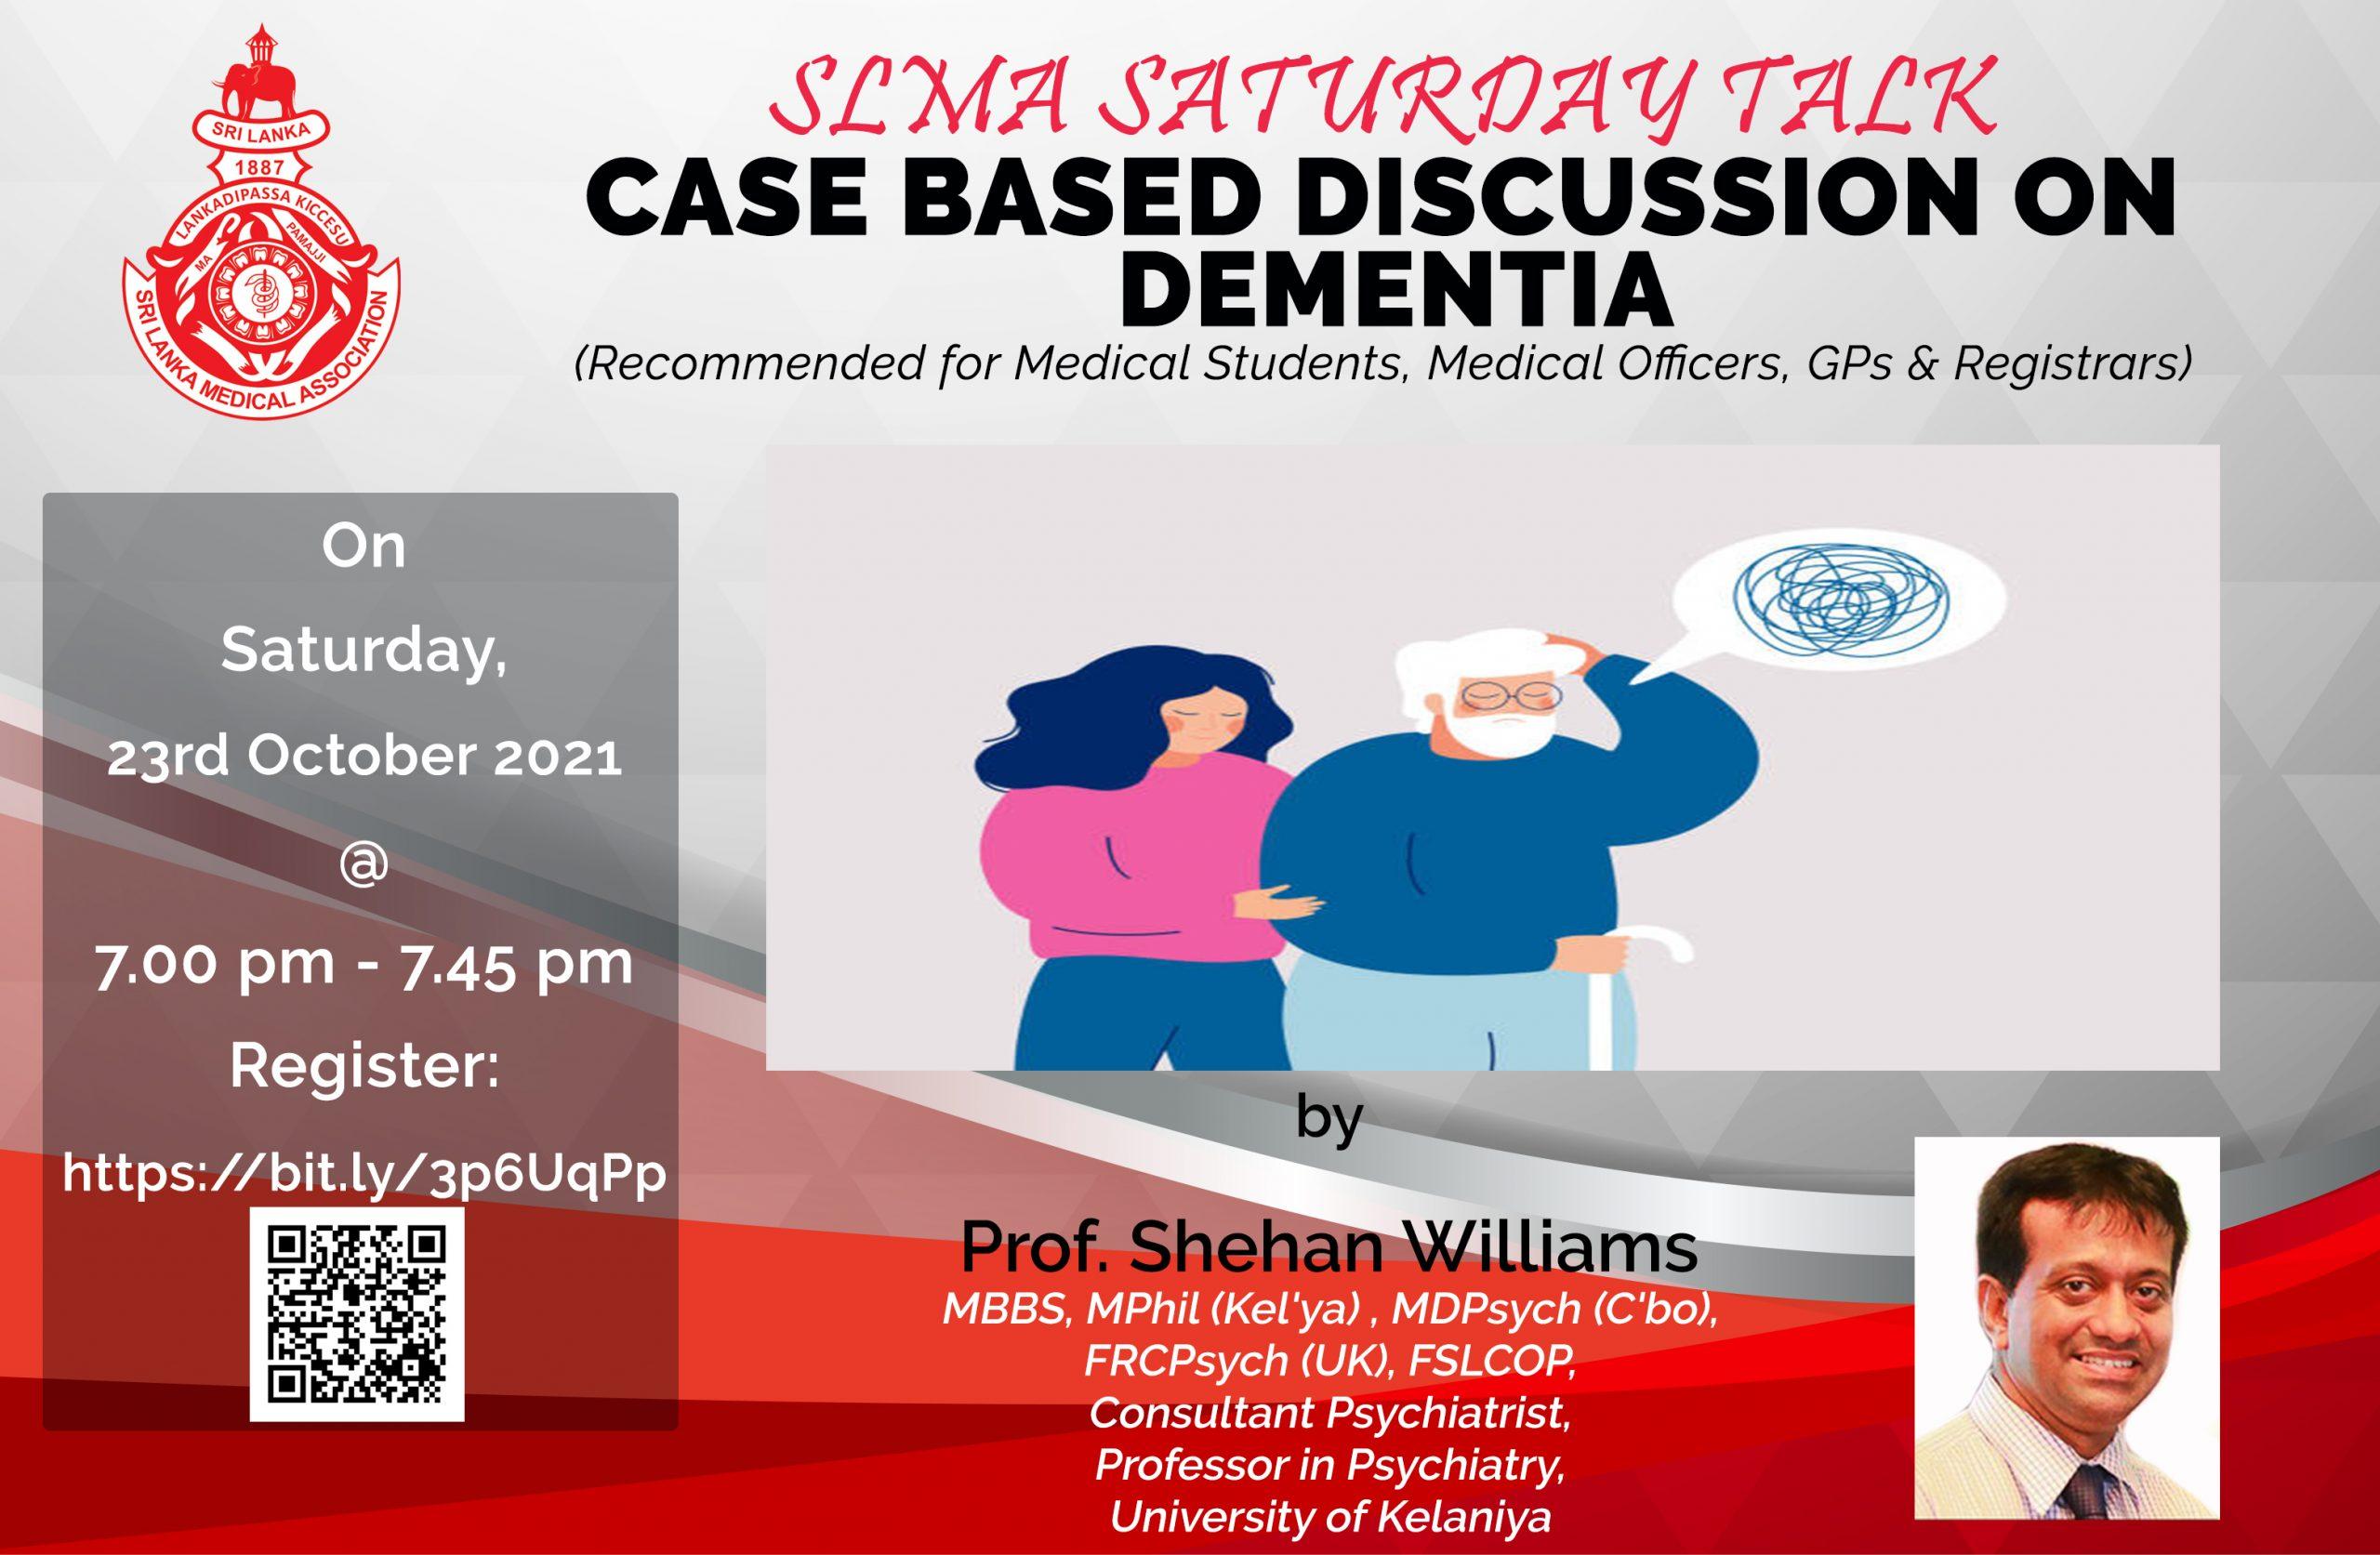 SLMA Saturday Talk Case based discussion on Dementia